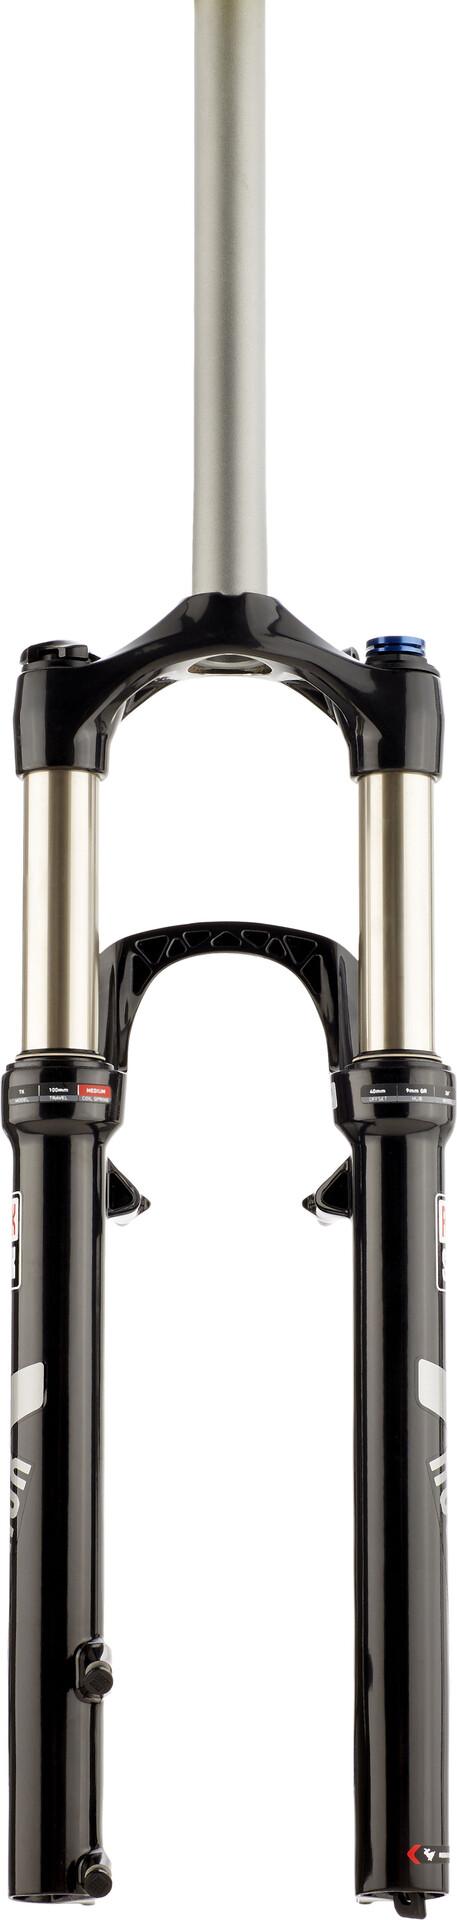 RockShox 30 Silver TK Coil 100 mm Federgabel schwarz 26 Zoll